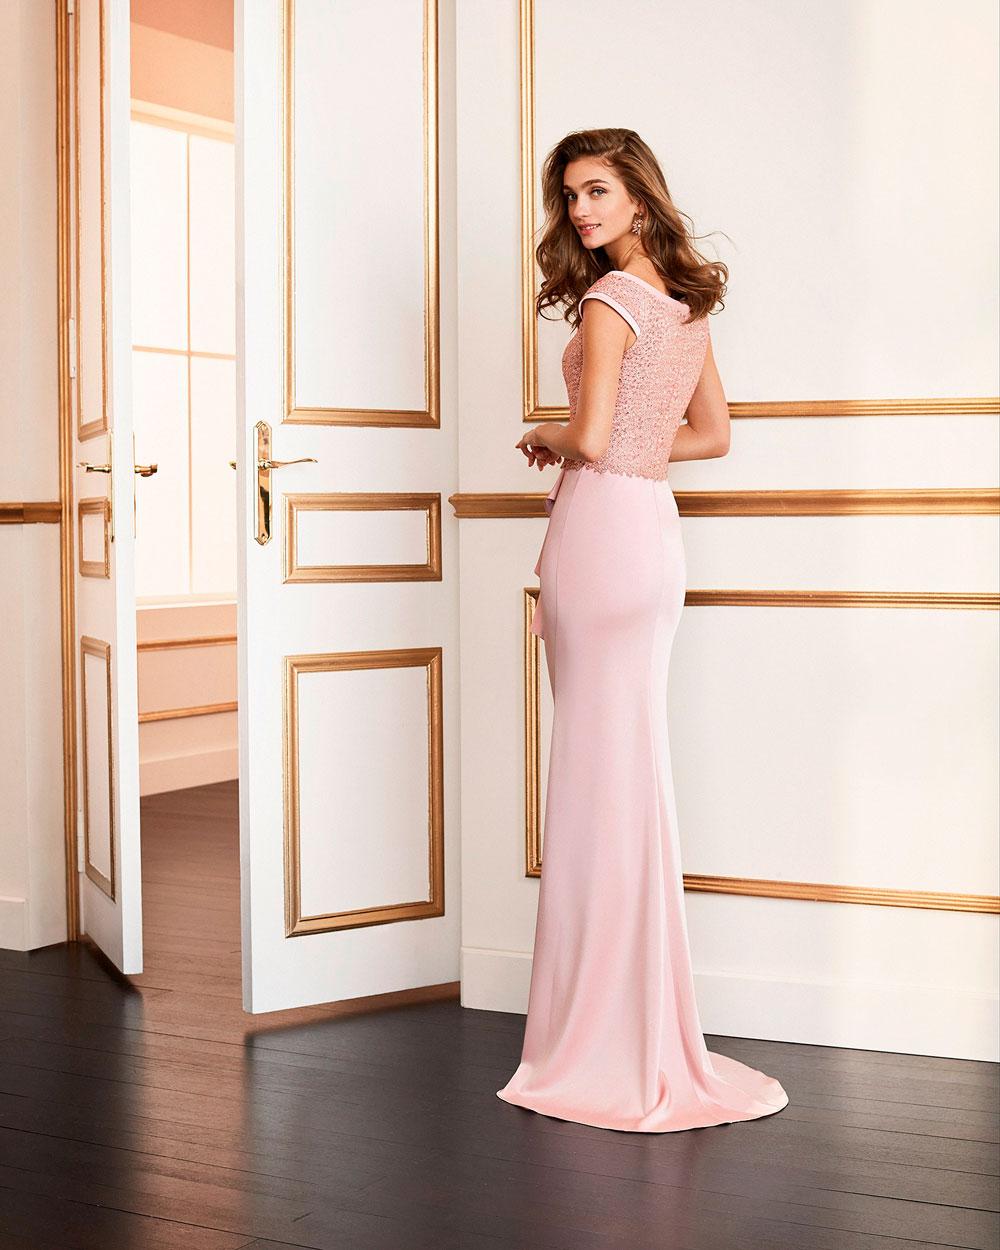 vestido de fiesta 2020 4J159 MARFIL BARCELONA 2